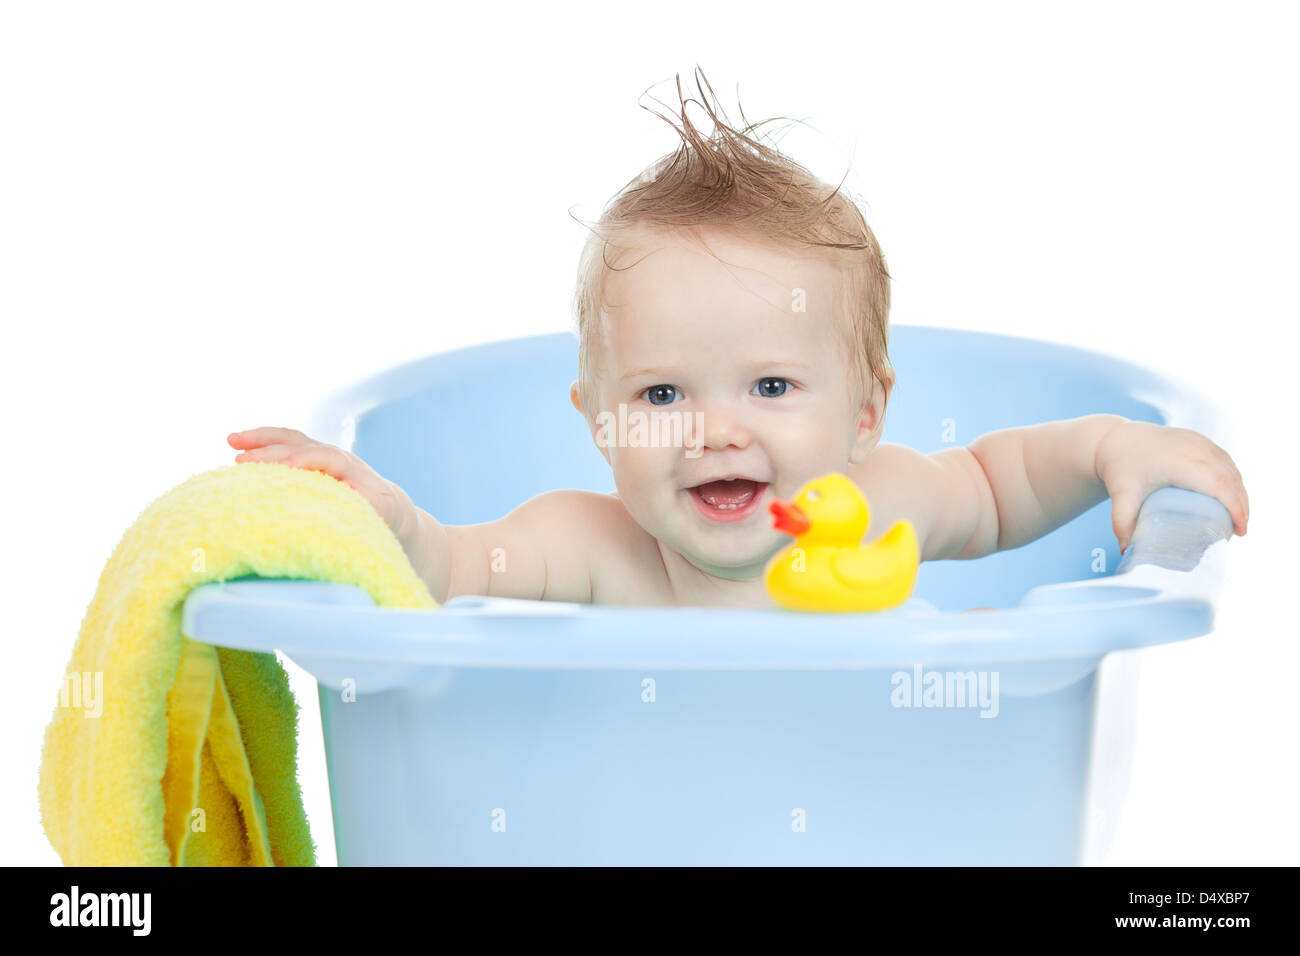 adorable baby having bath in blue tub Stock Photo: 54669727 - Alamy